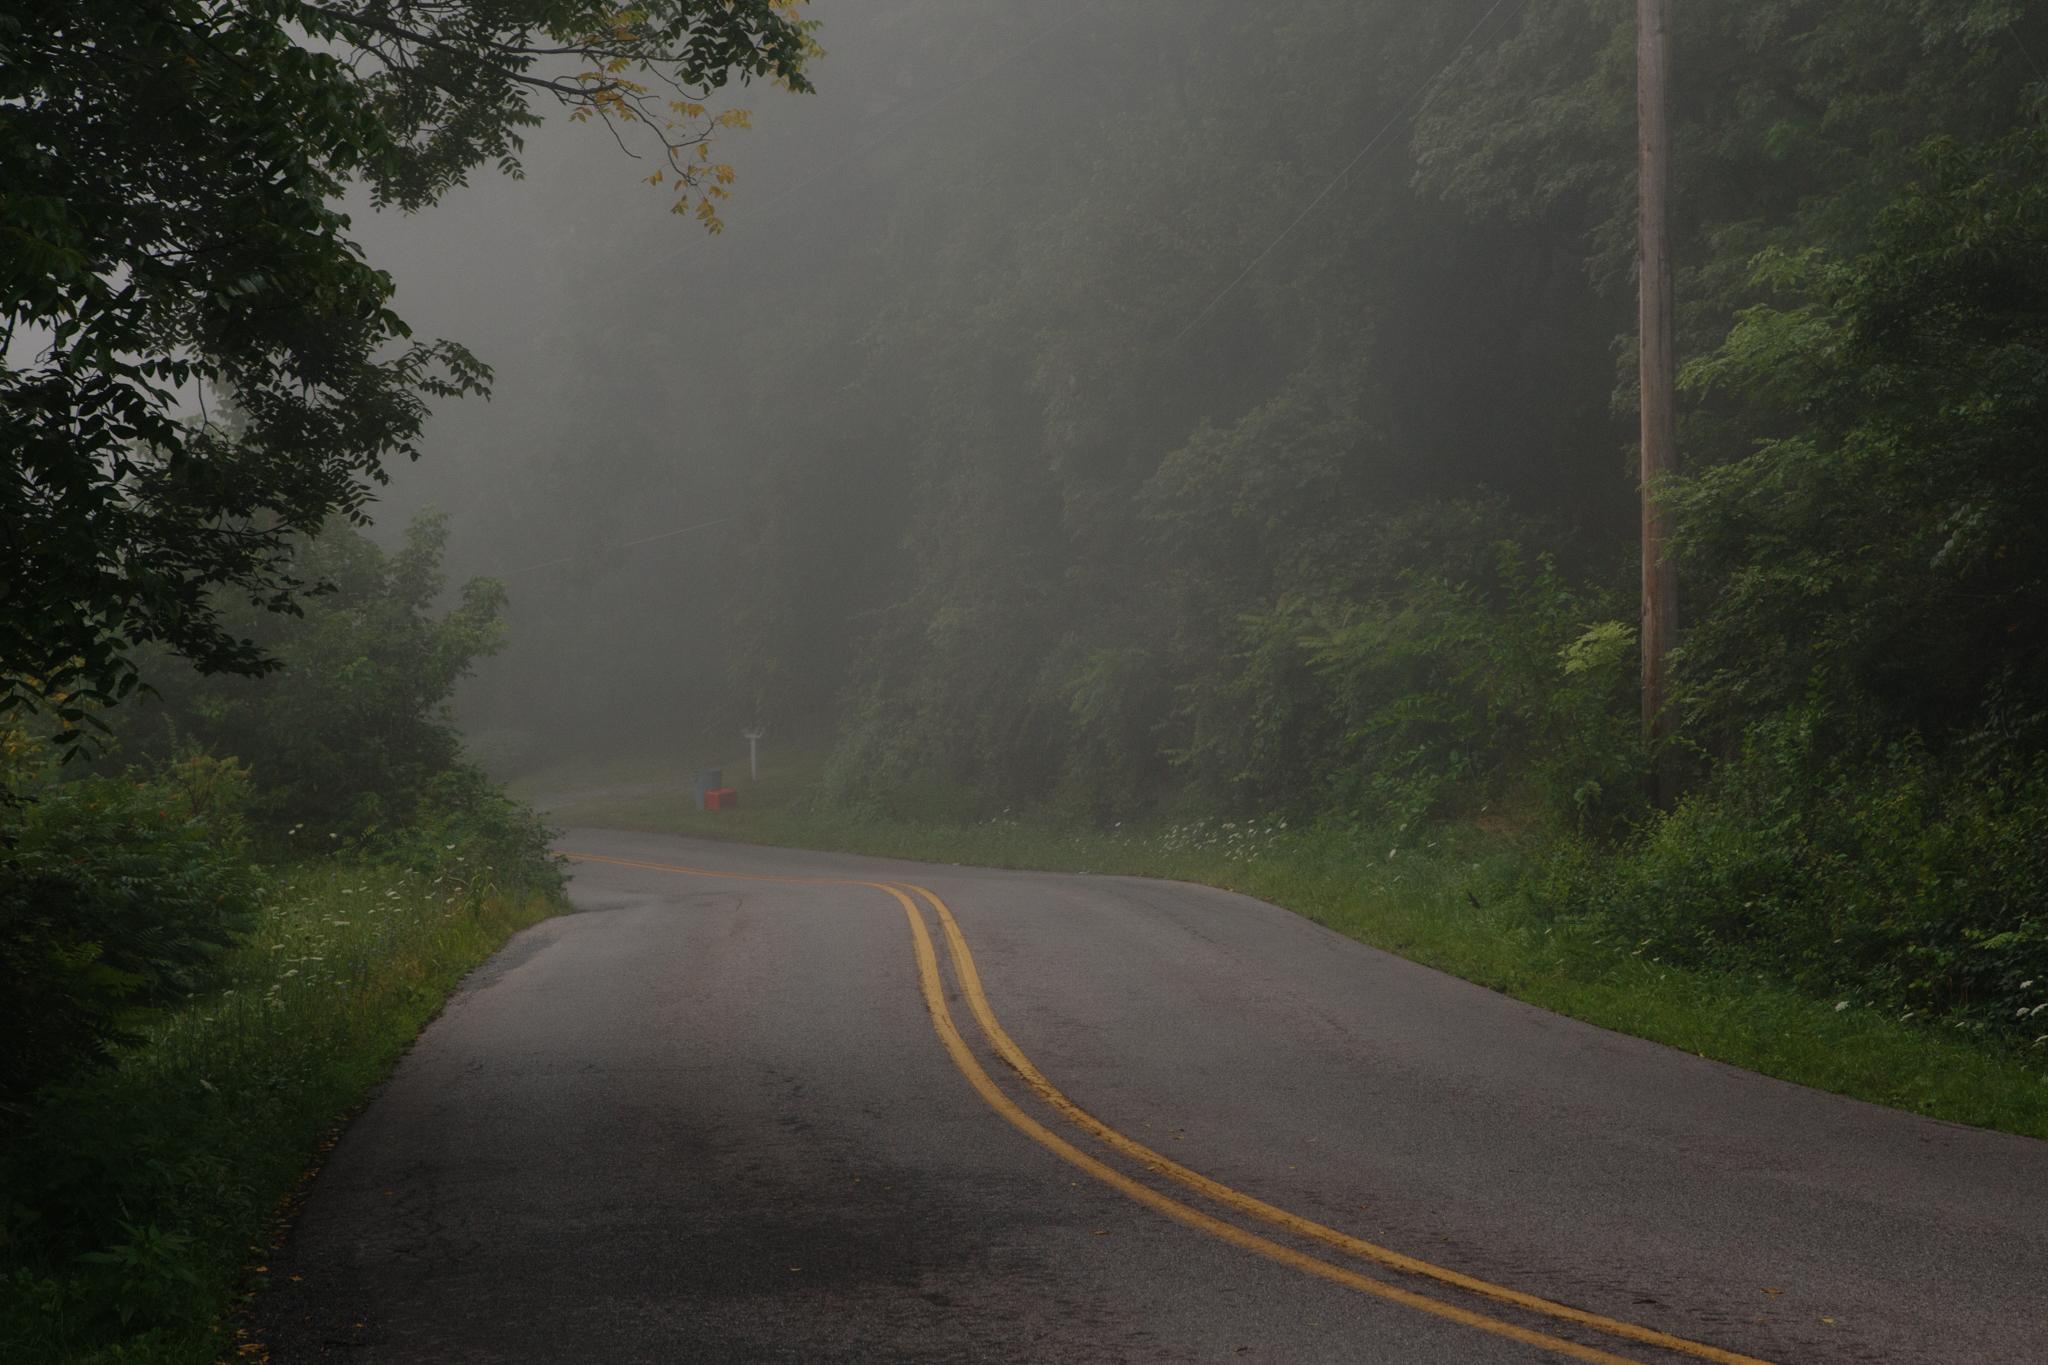 209 // 365 Foggy morning leaving the lane